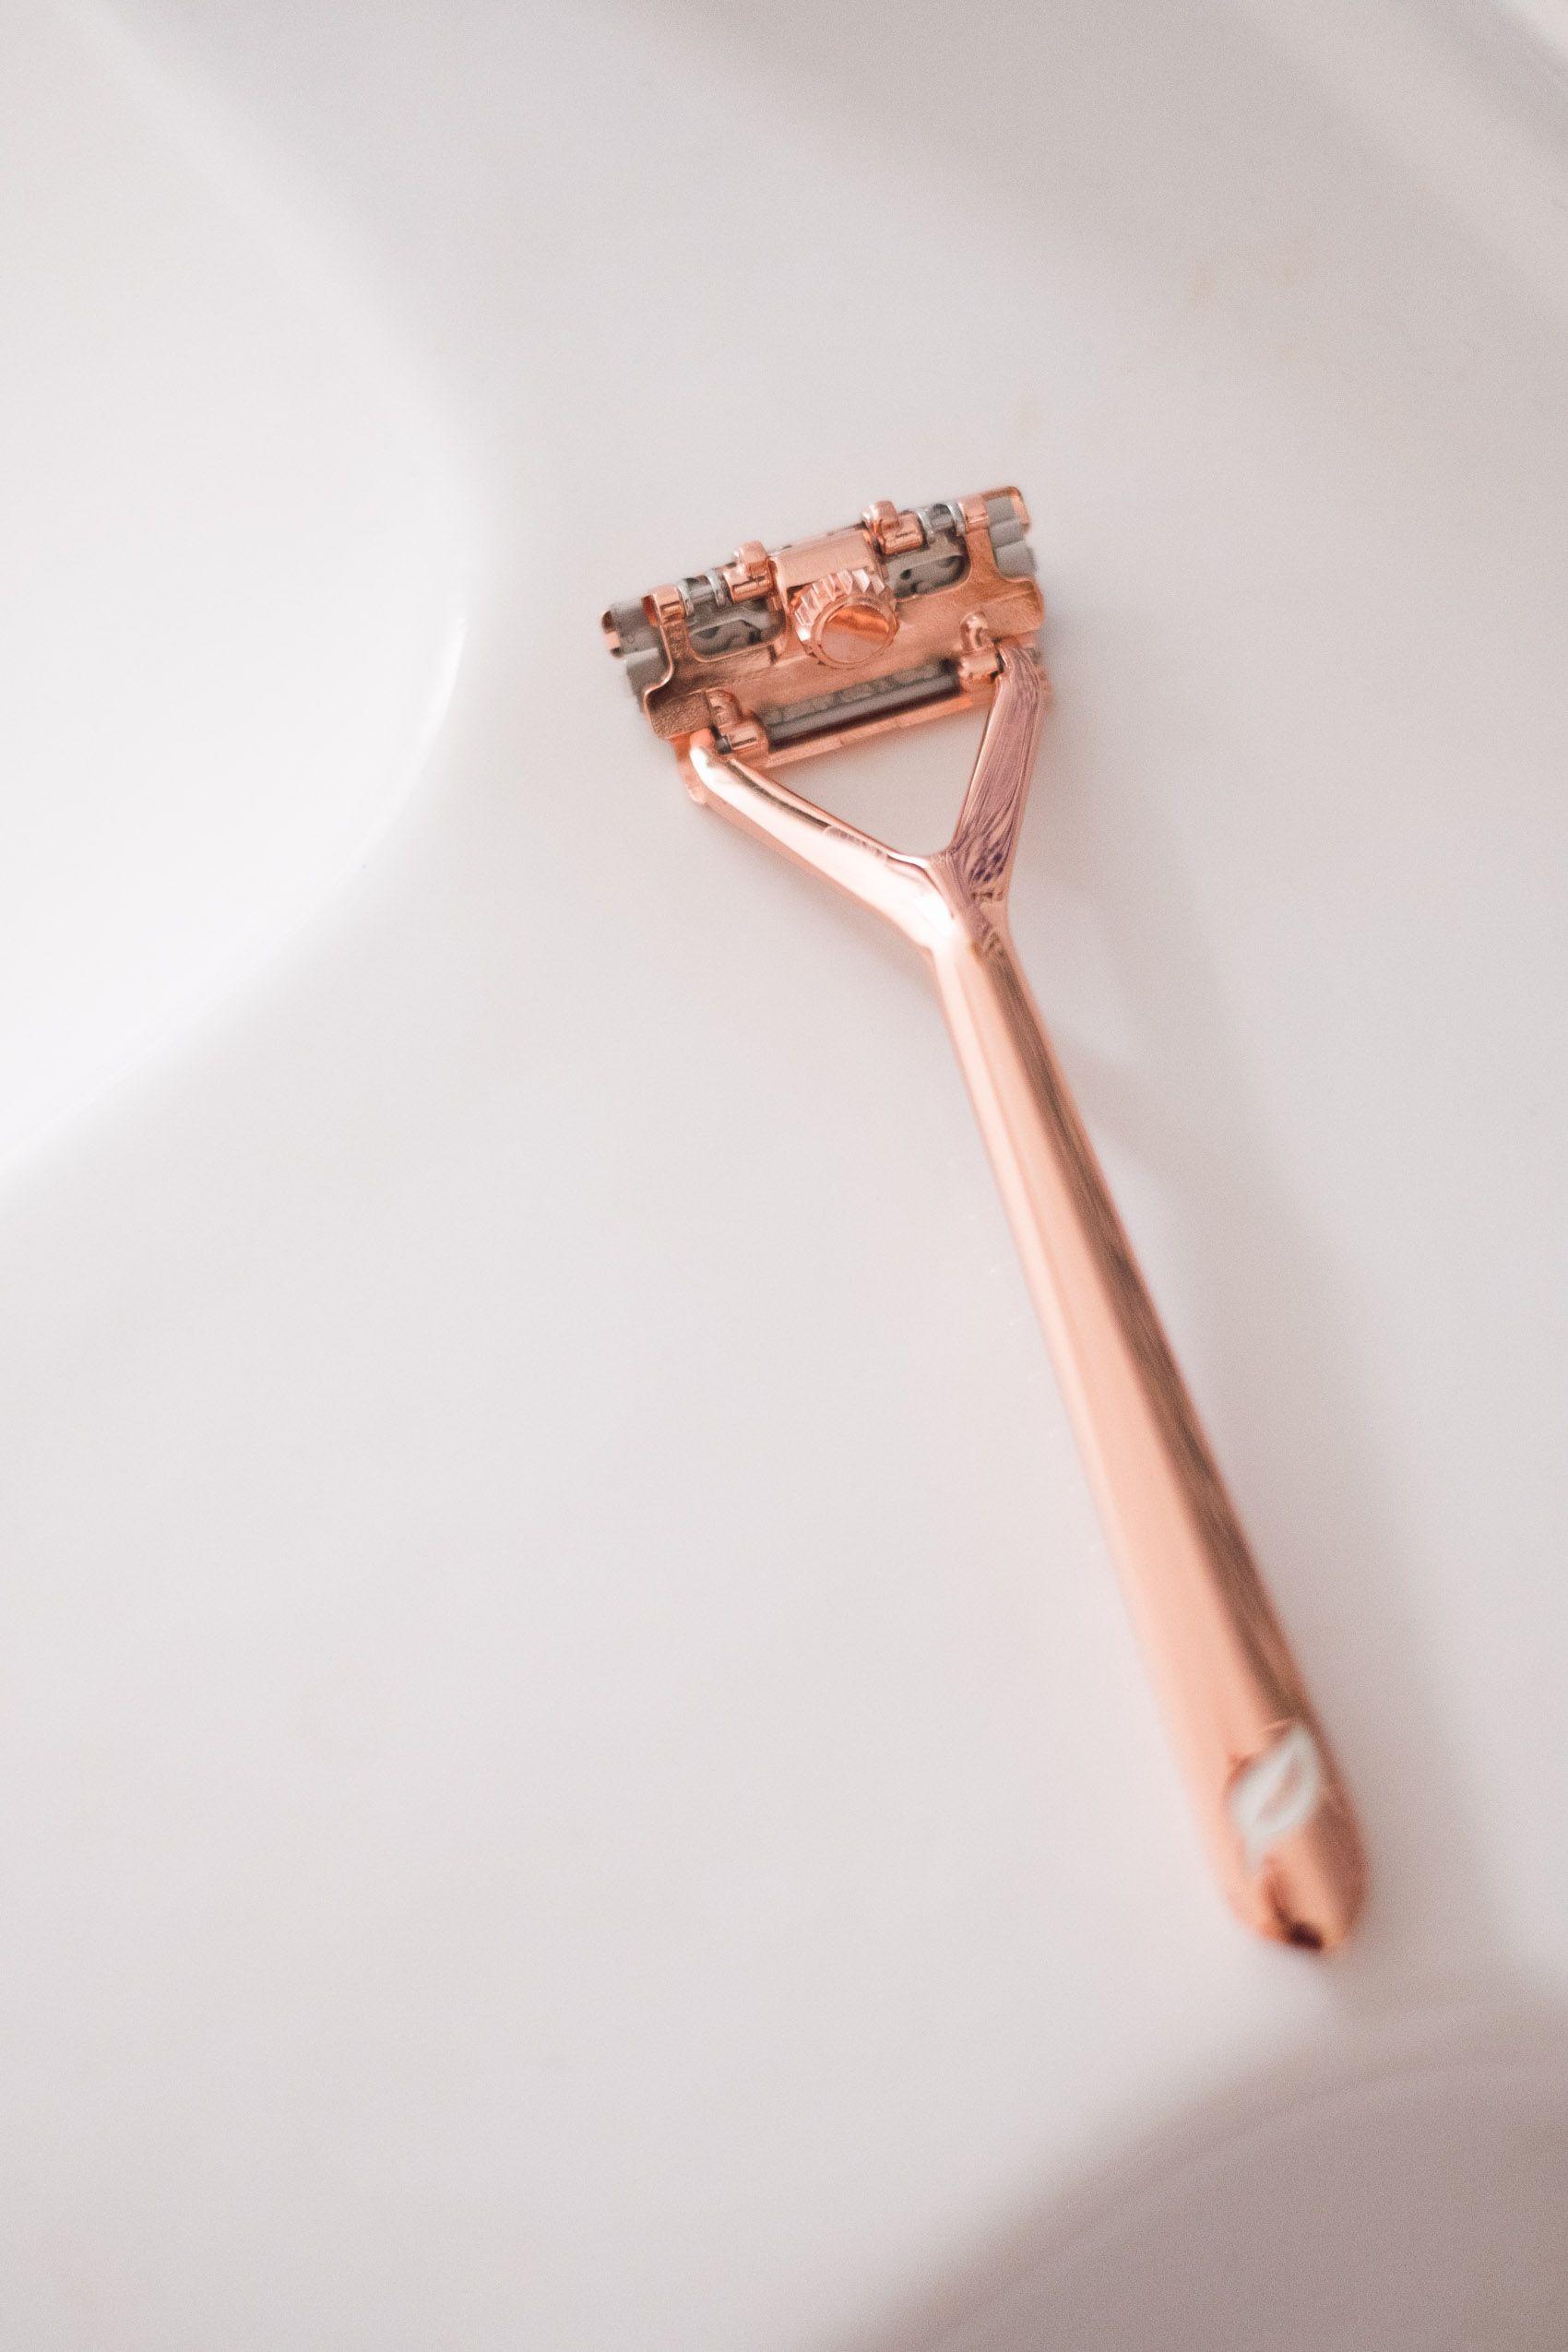 Plastic Free Shaving with the Leaf Shave Rasierhobel